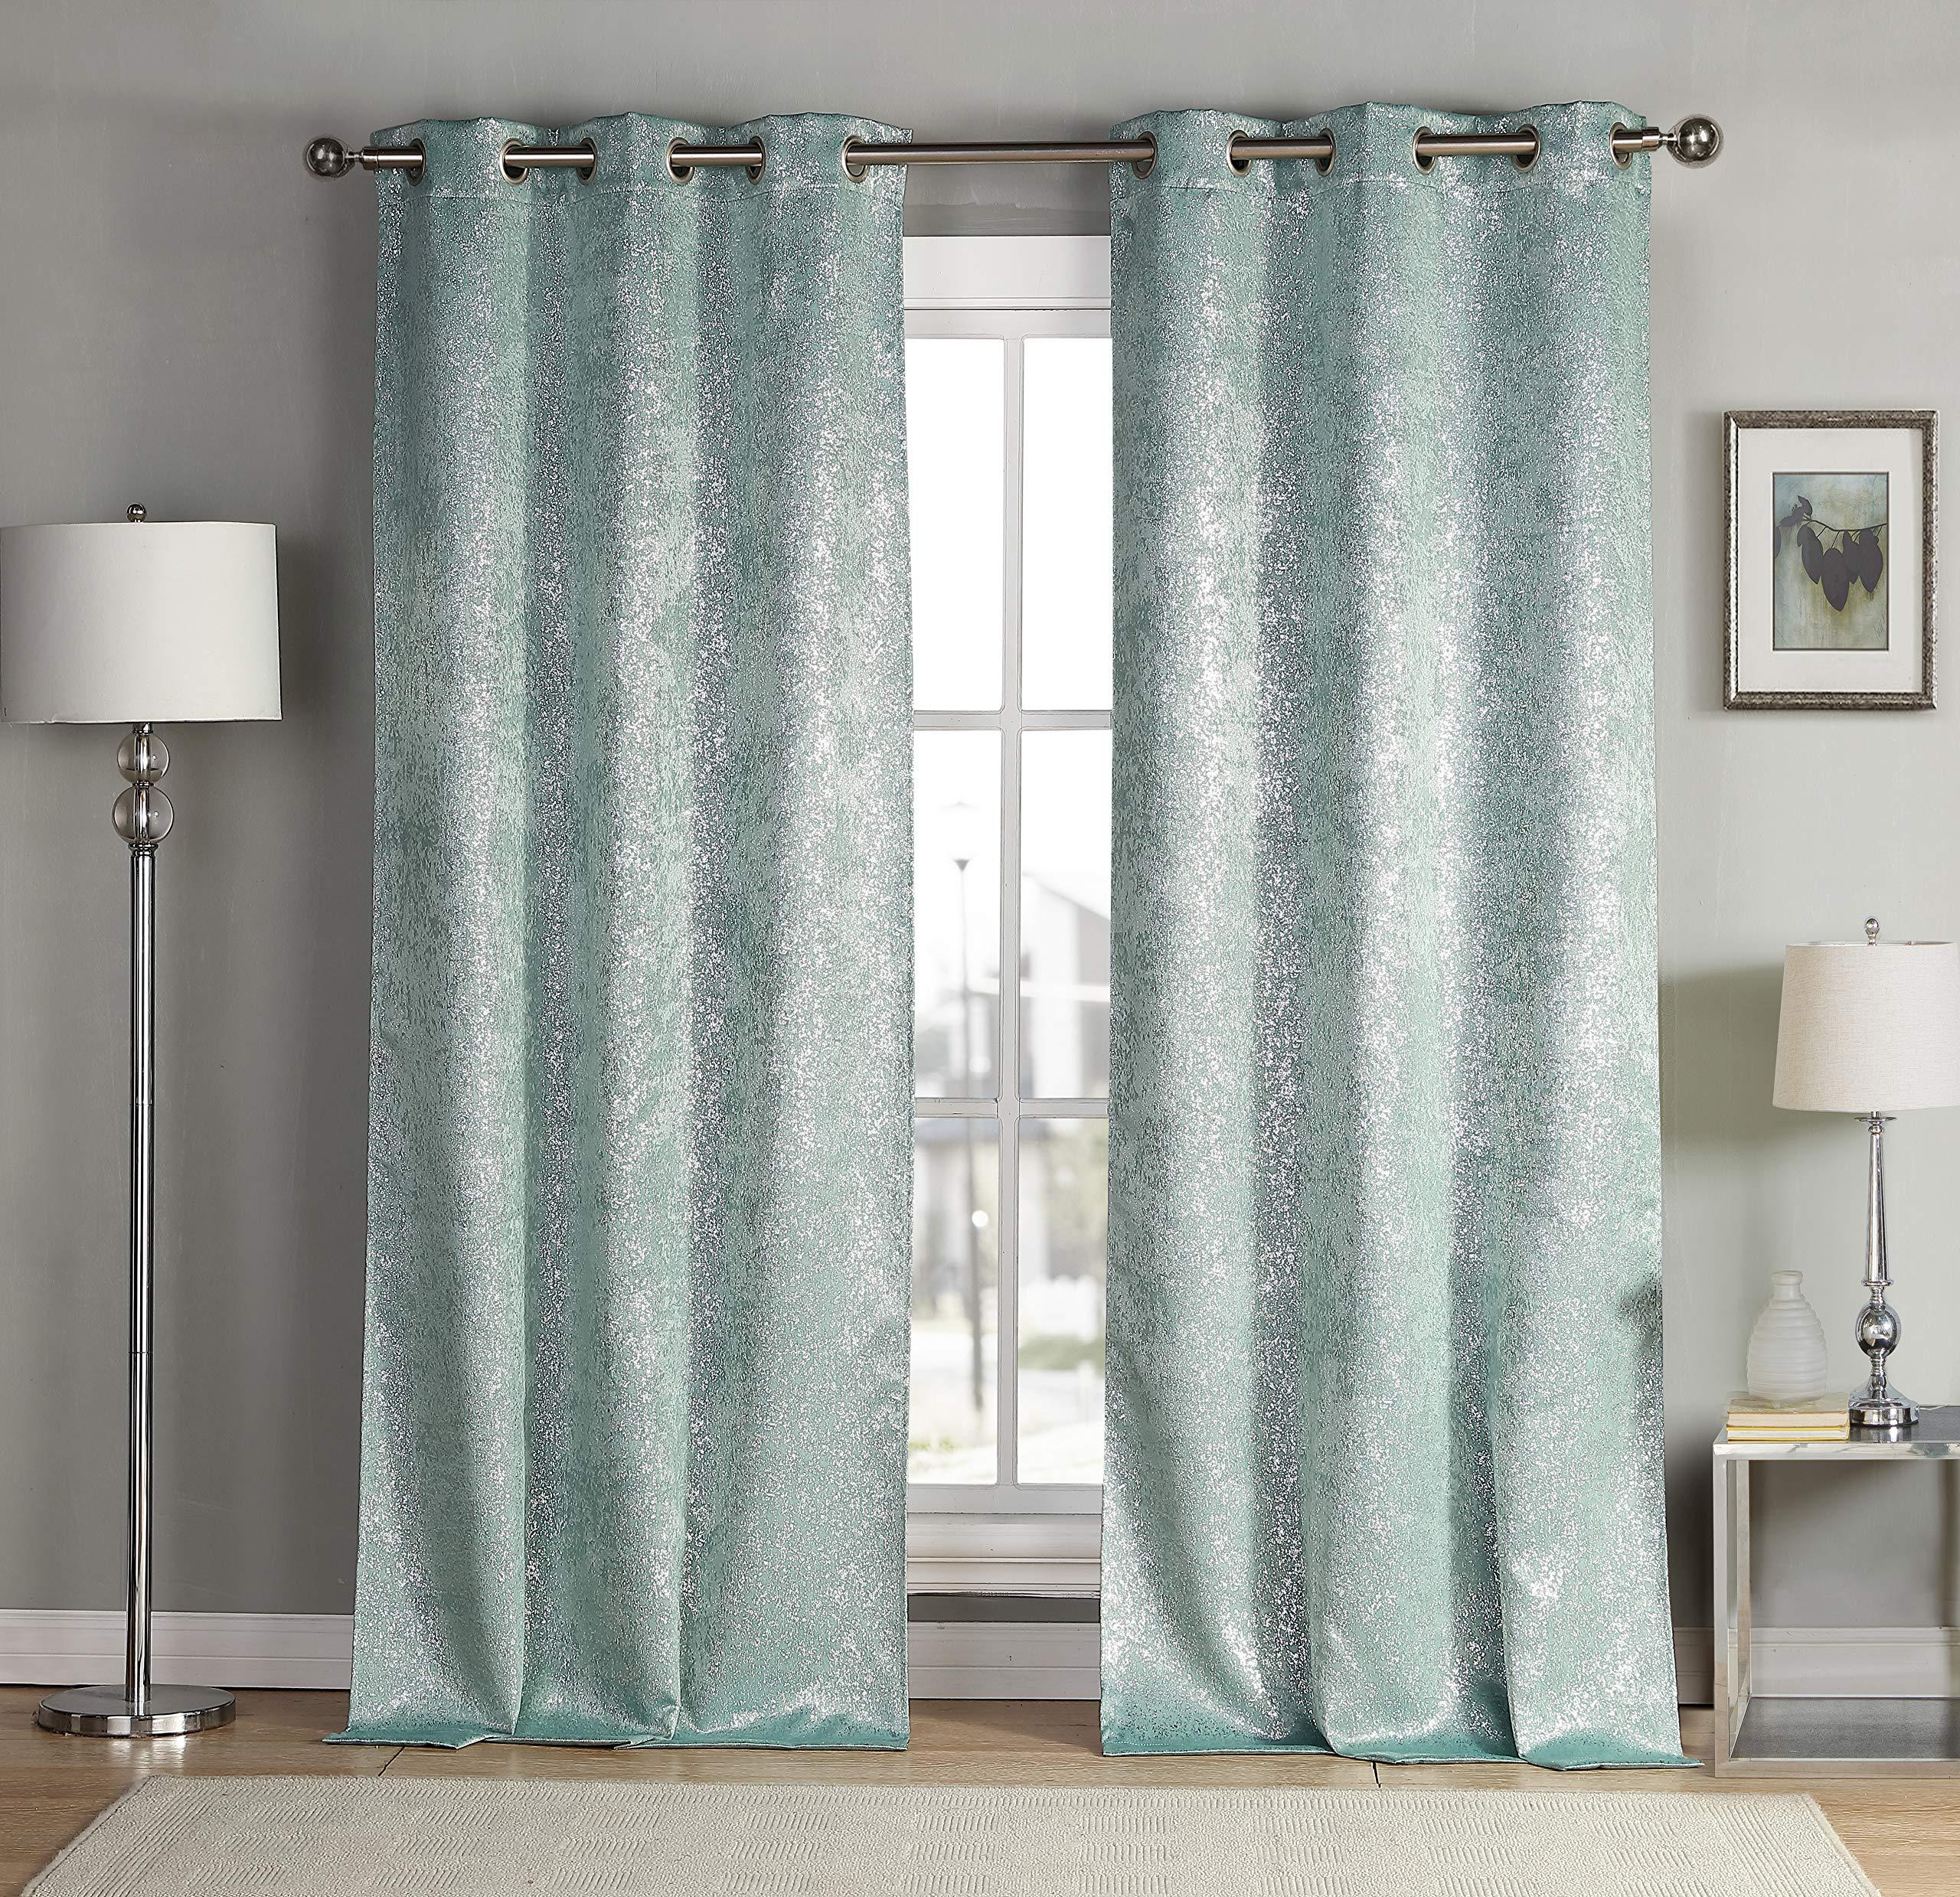 Duck River Textile Maddie Blackout Curtains, Seafoam